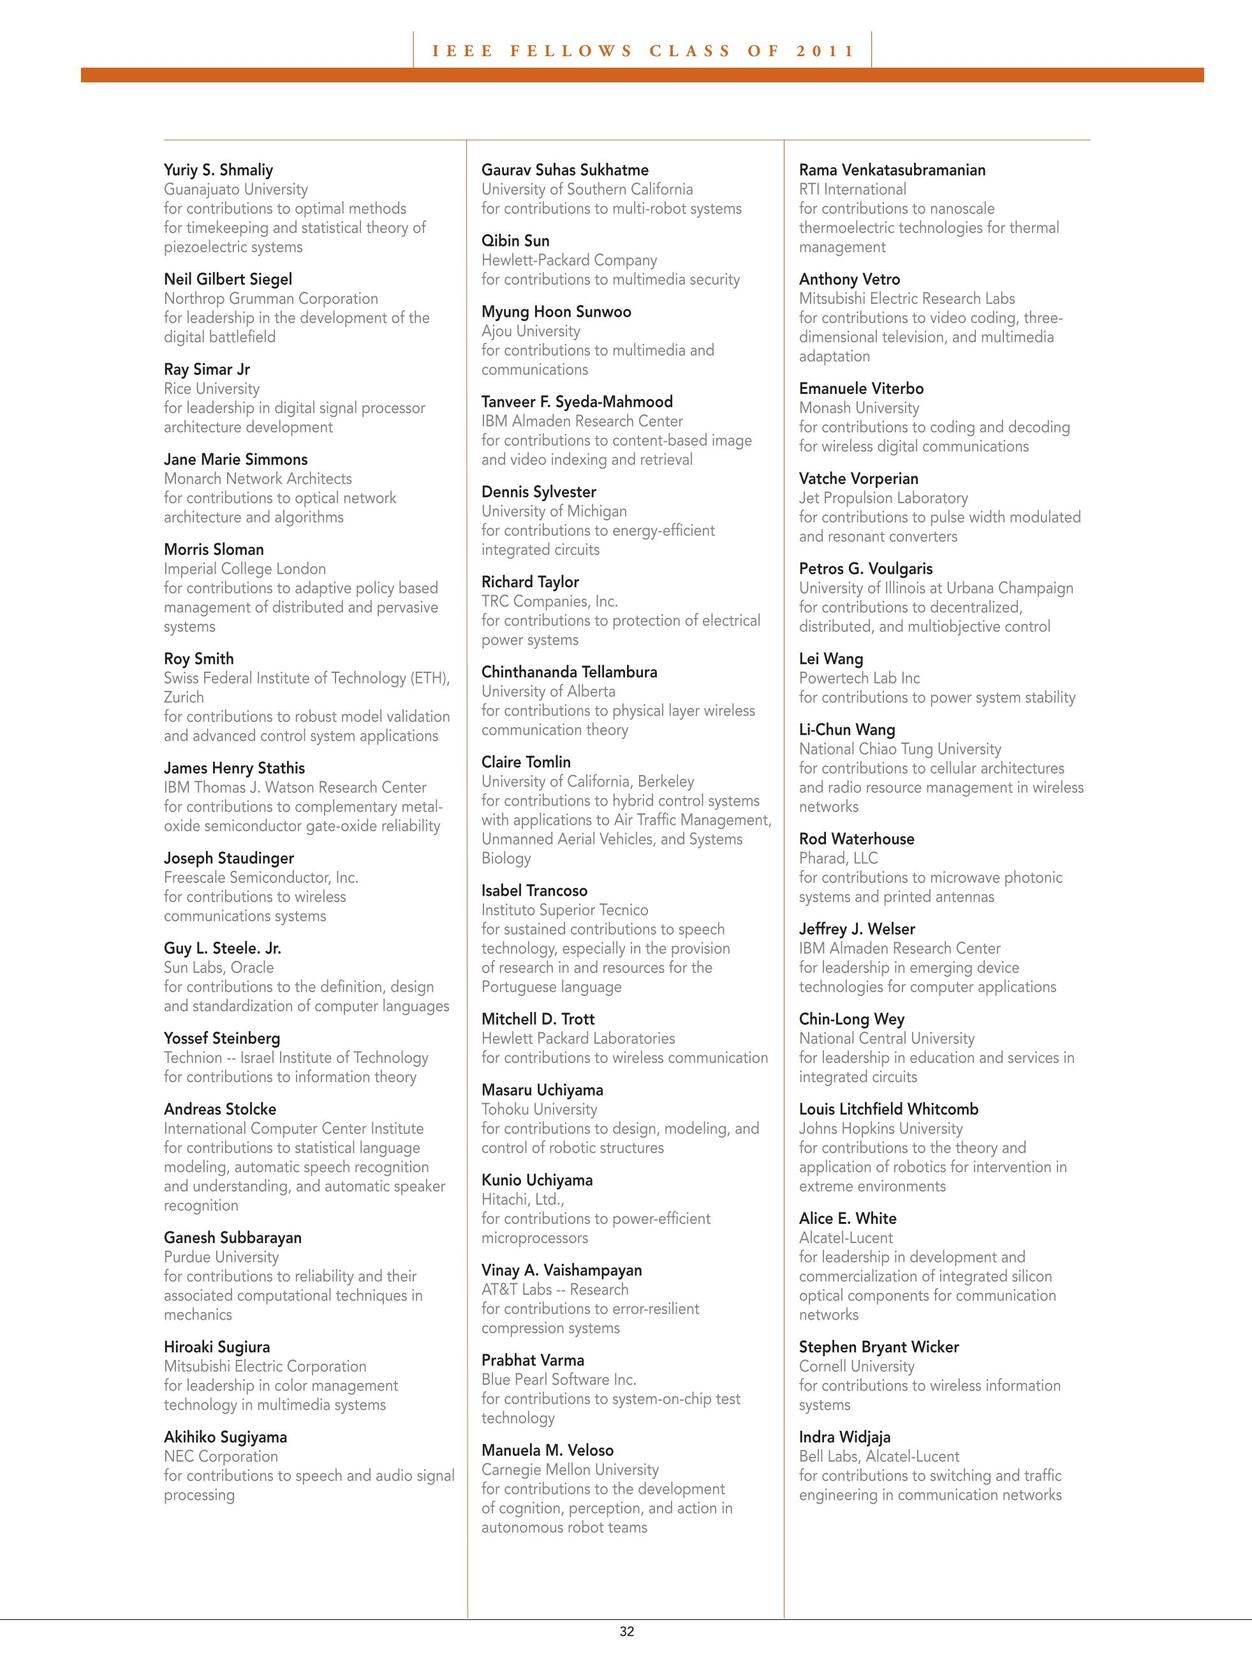 IEEE Awards Booklet - 2011